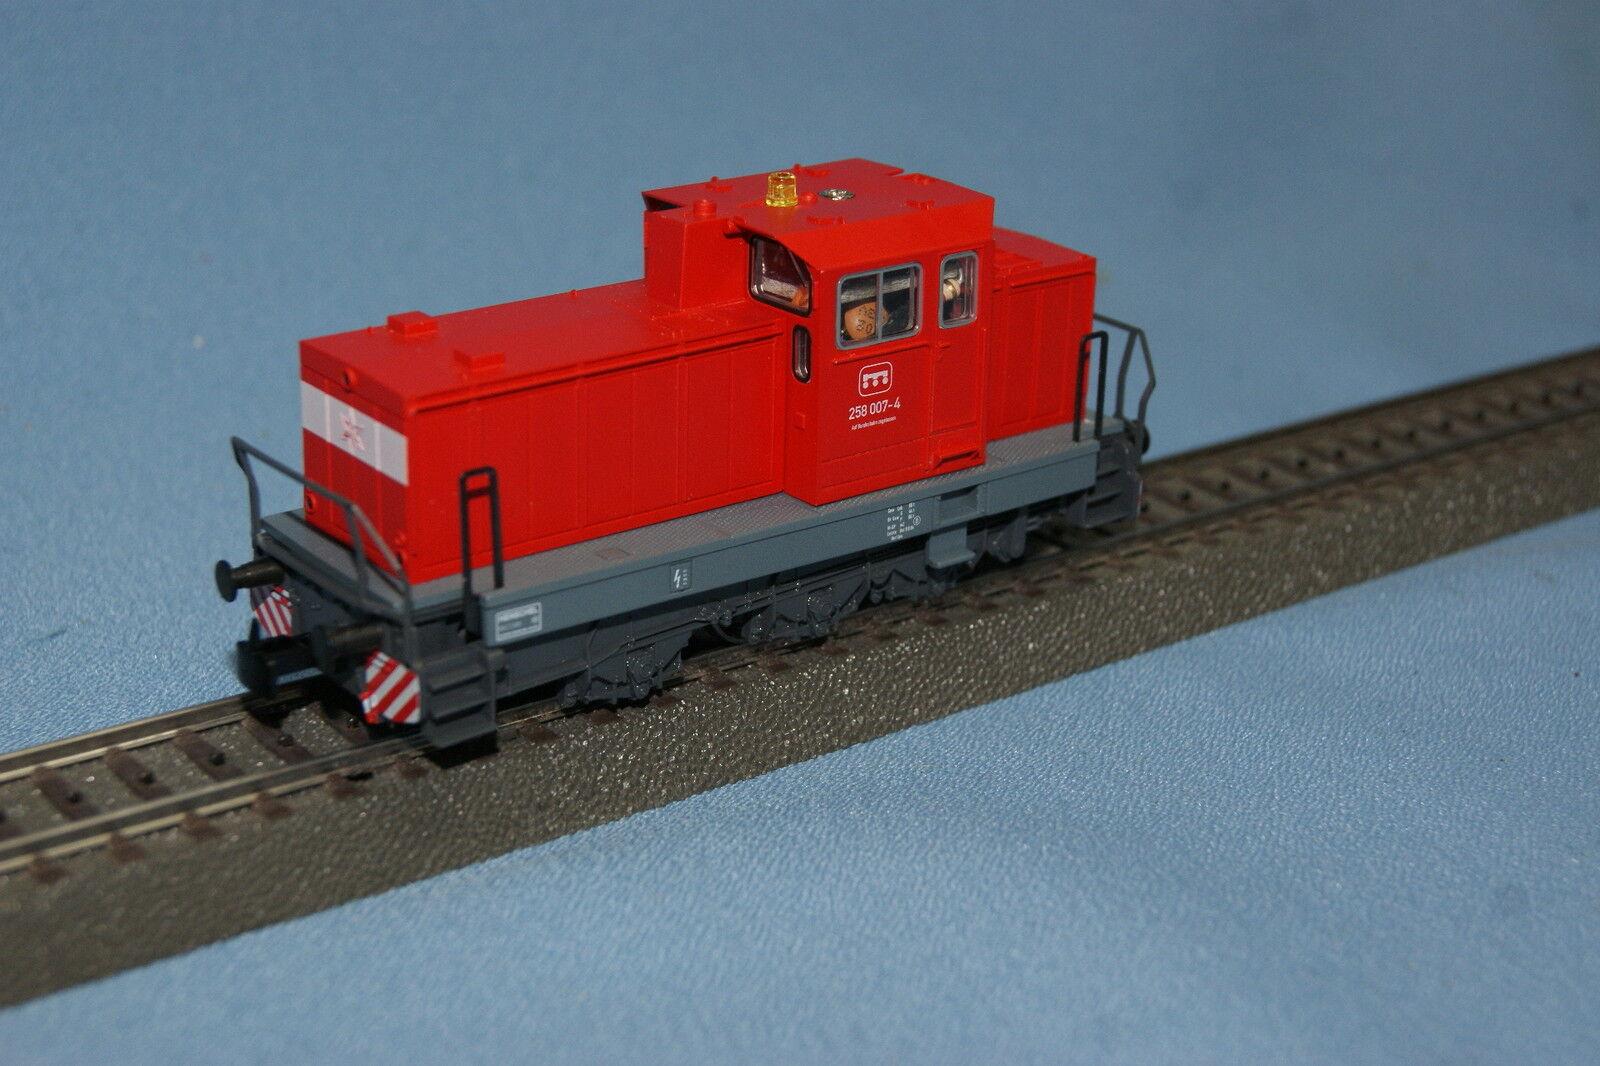 Marklin 36880 Diesellokomotiv DHG 700 C Trafikröd 258 007 -4